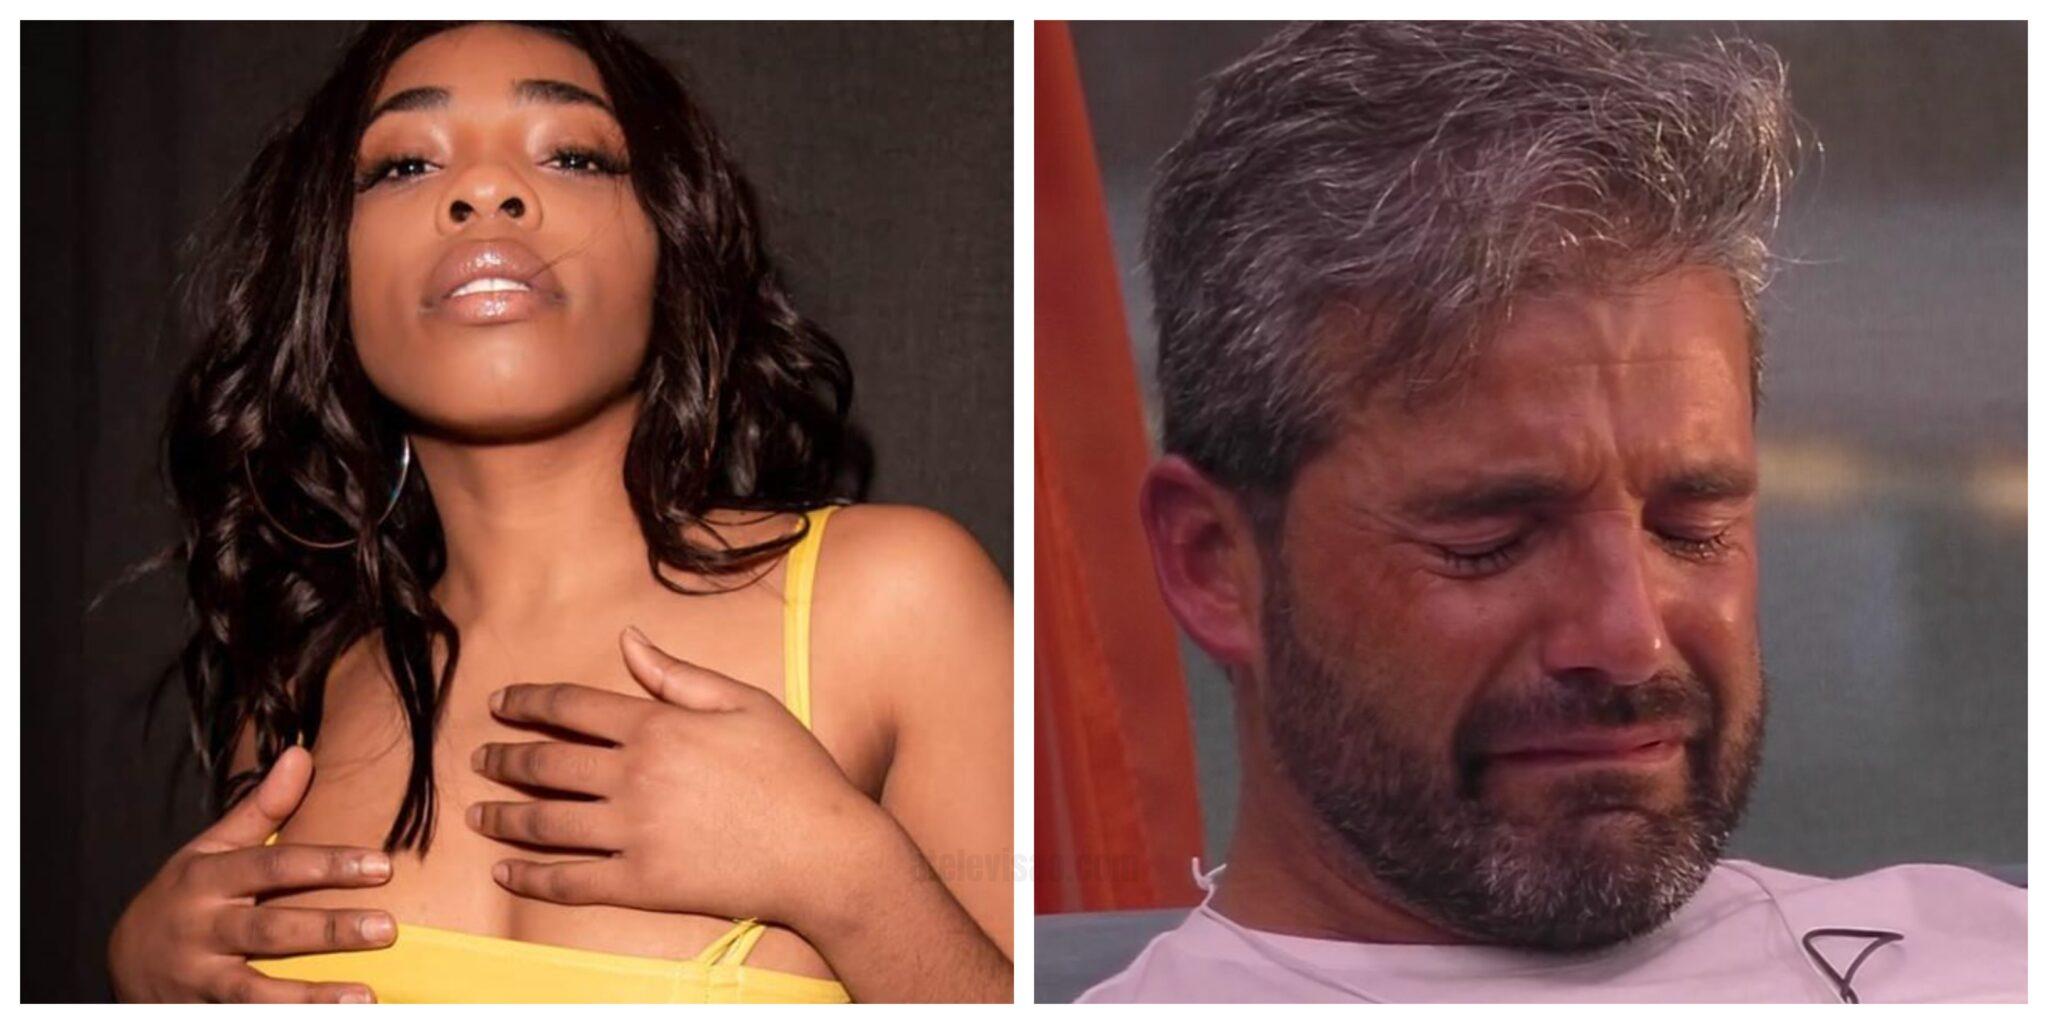 Lia Helder Big Brother Scaled Eliane De 'Love On Top' Insultada Após Criticar Hélder E Pedro Alves: &Quot;Devias Ser Escrava&Quot;